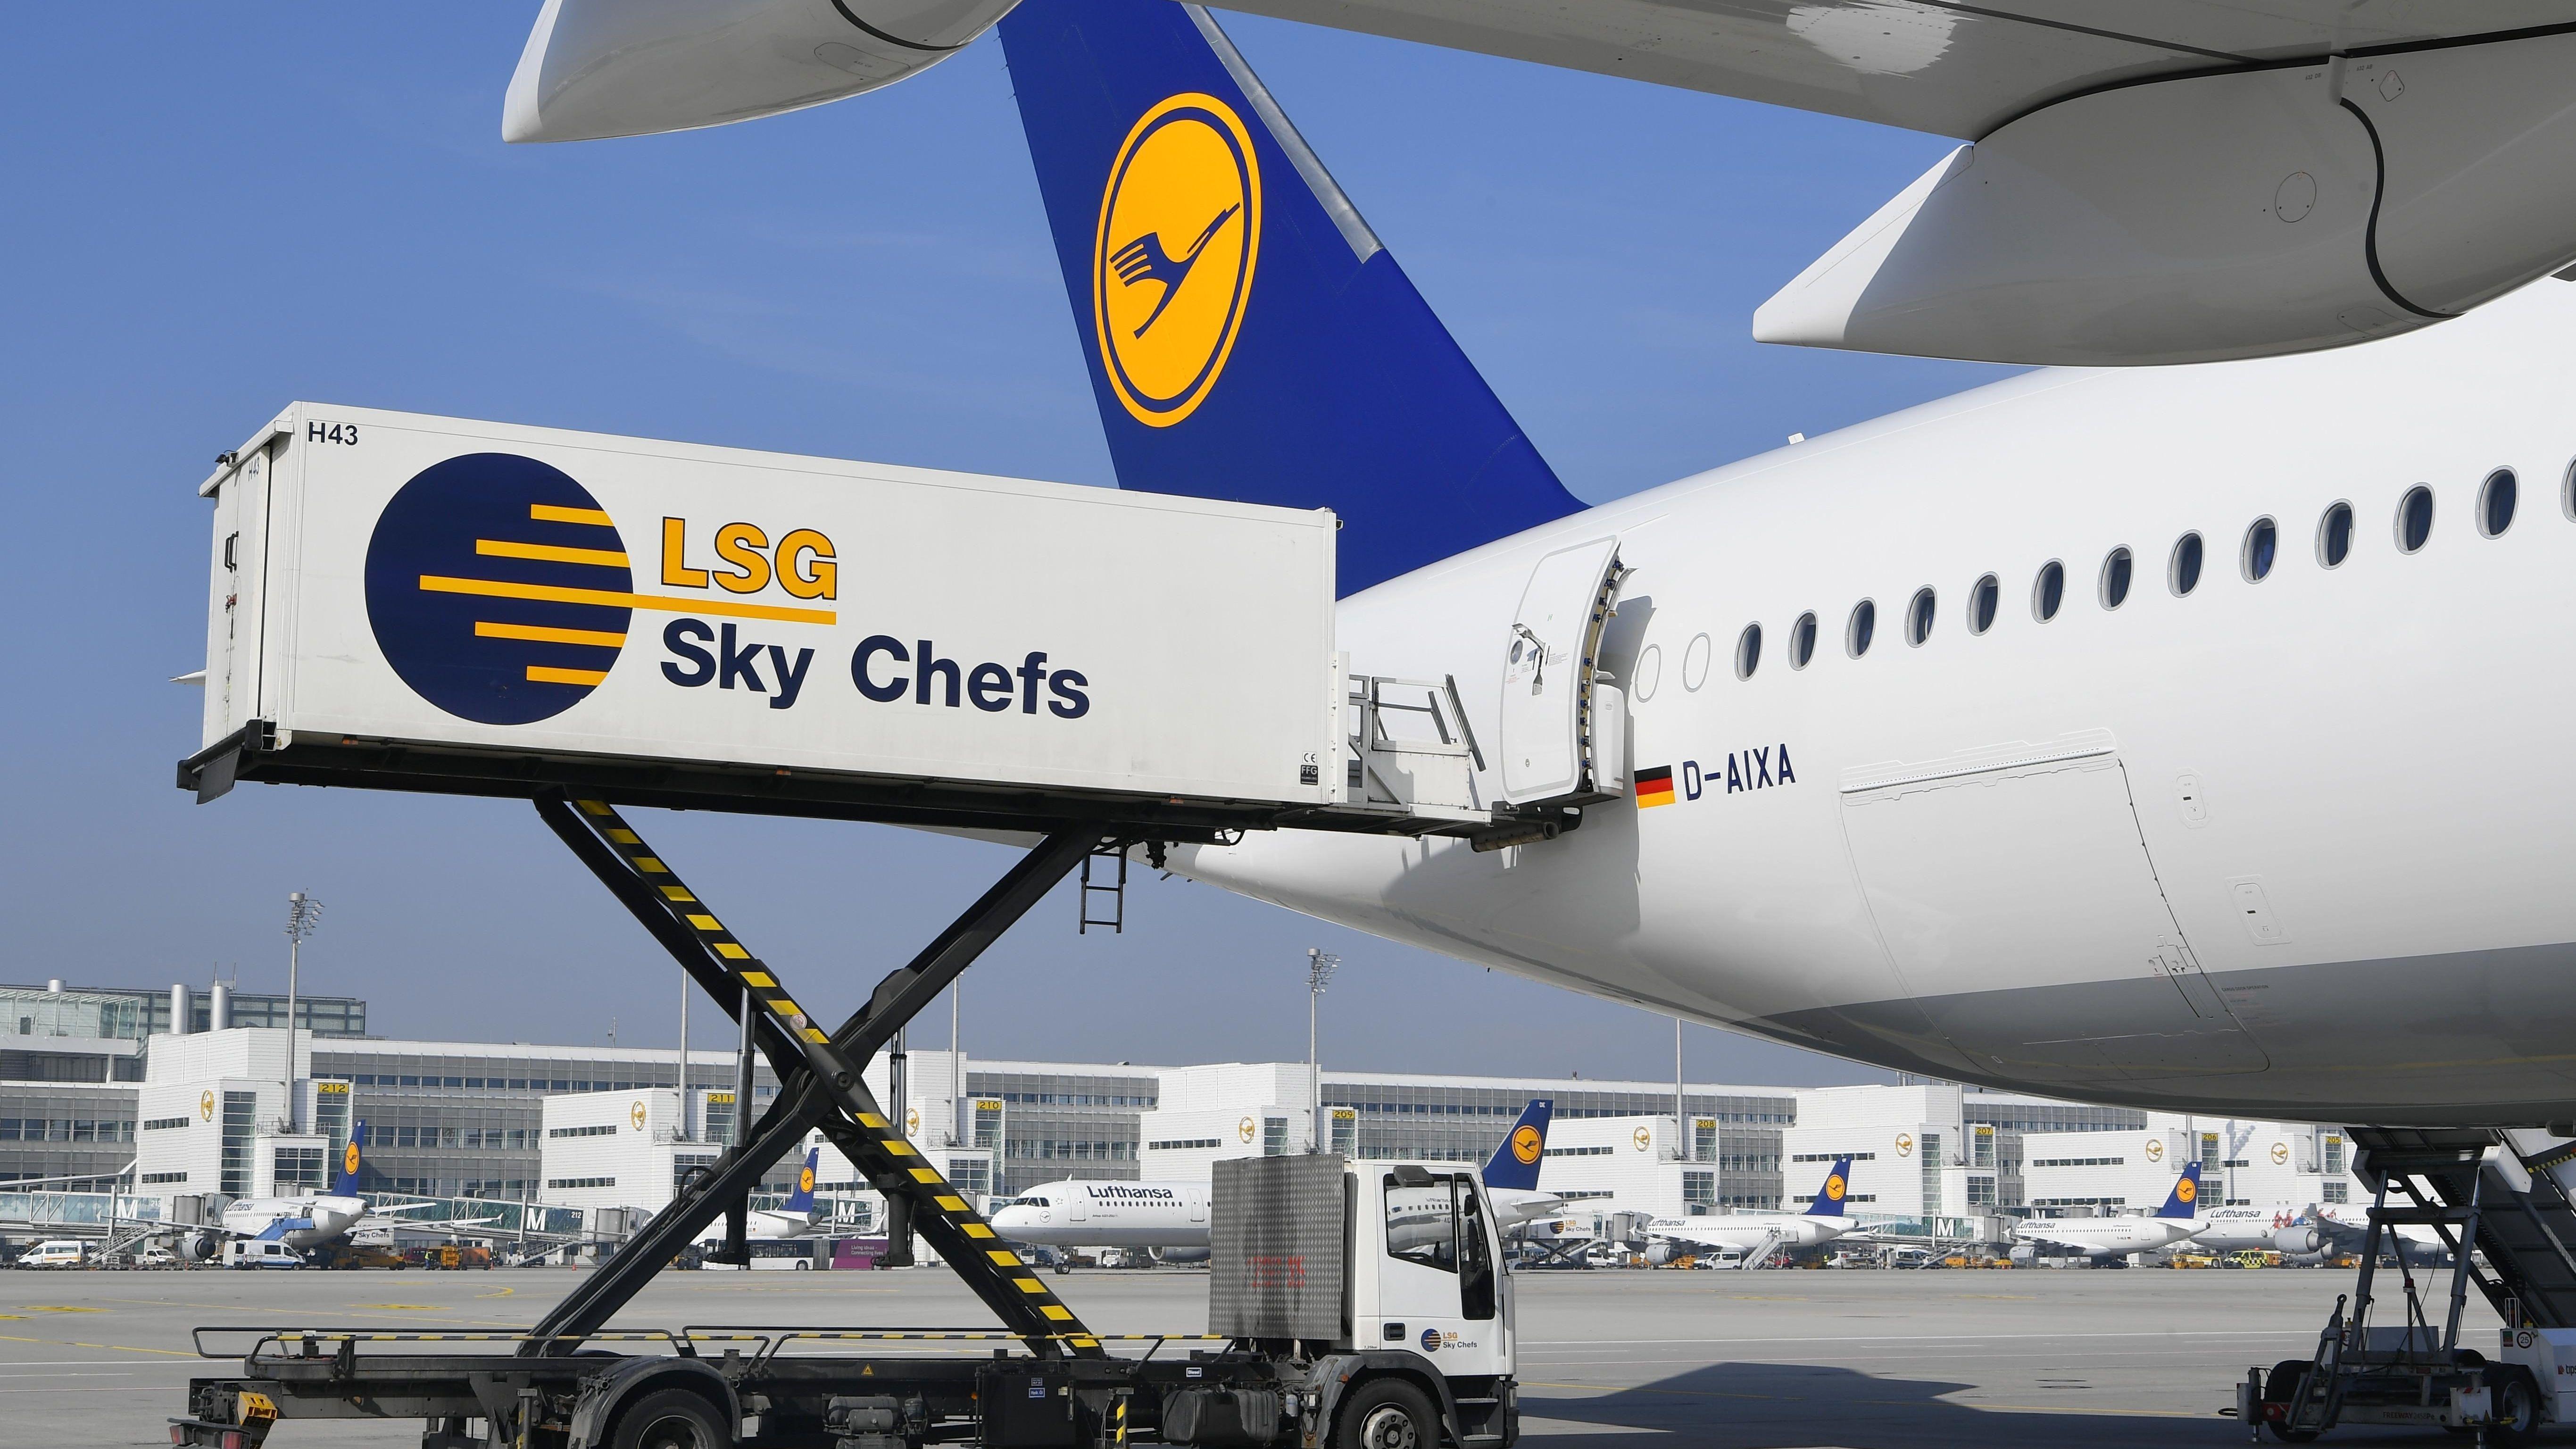 Catering Abfertigung durch LSG Sky Chefs, Lufthansa Airbus A350-900